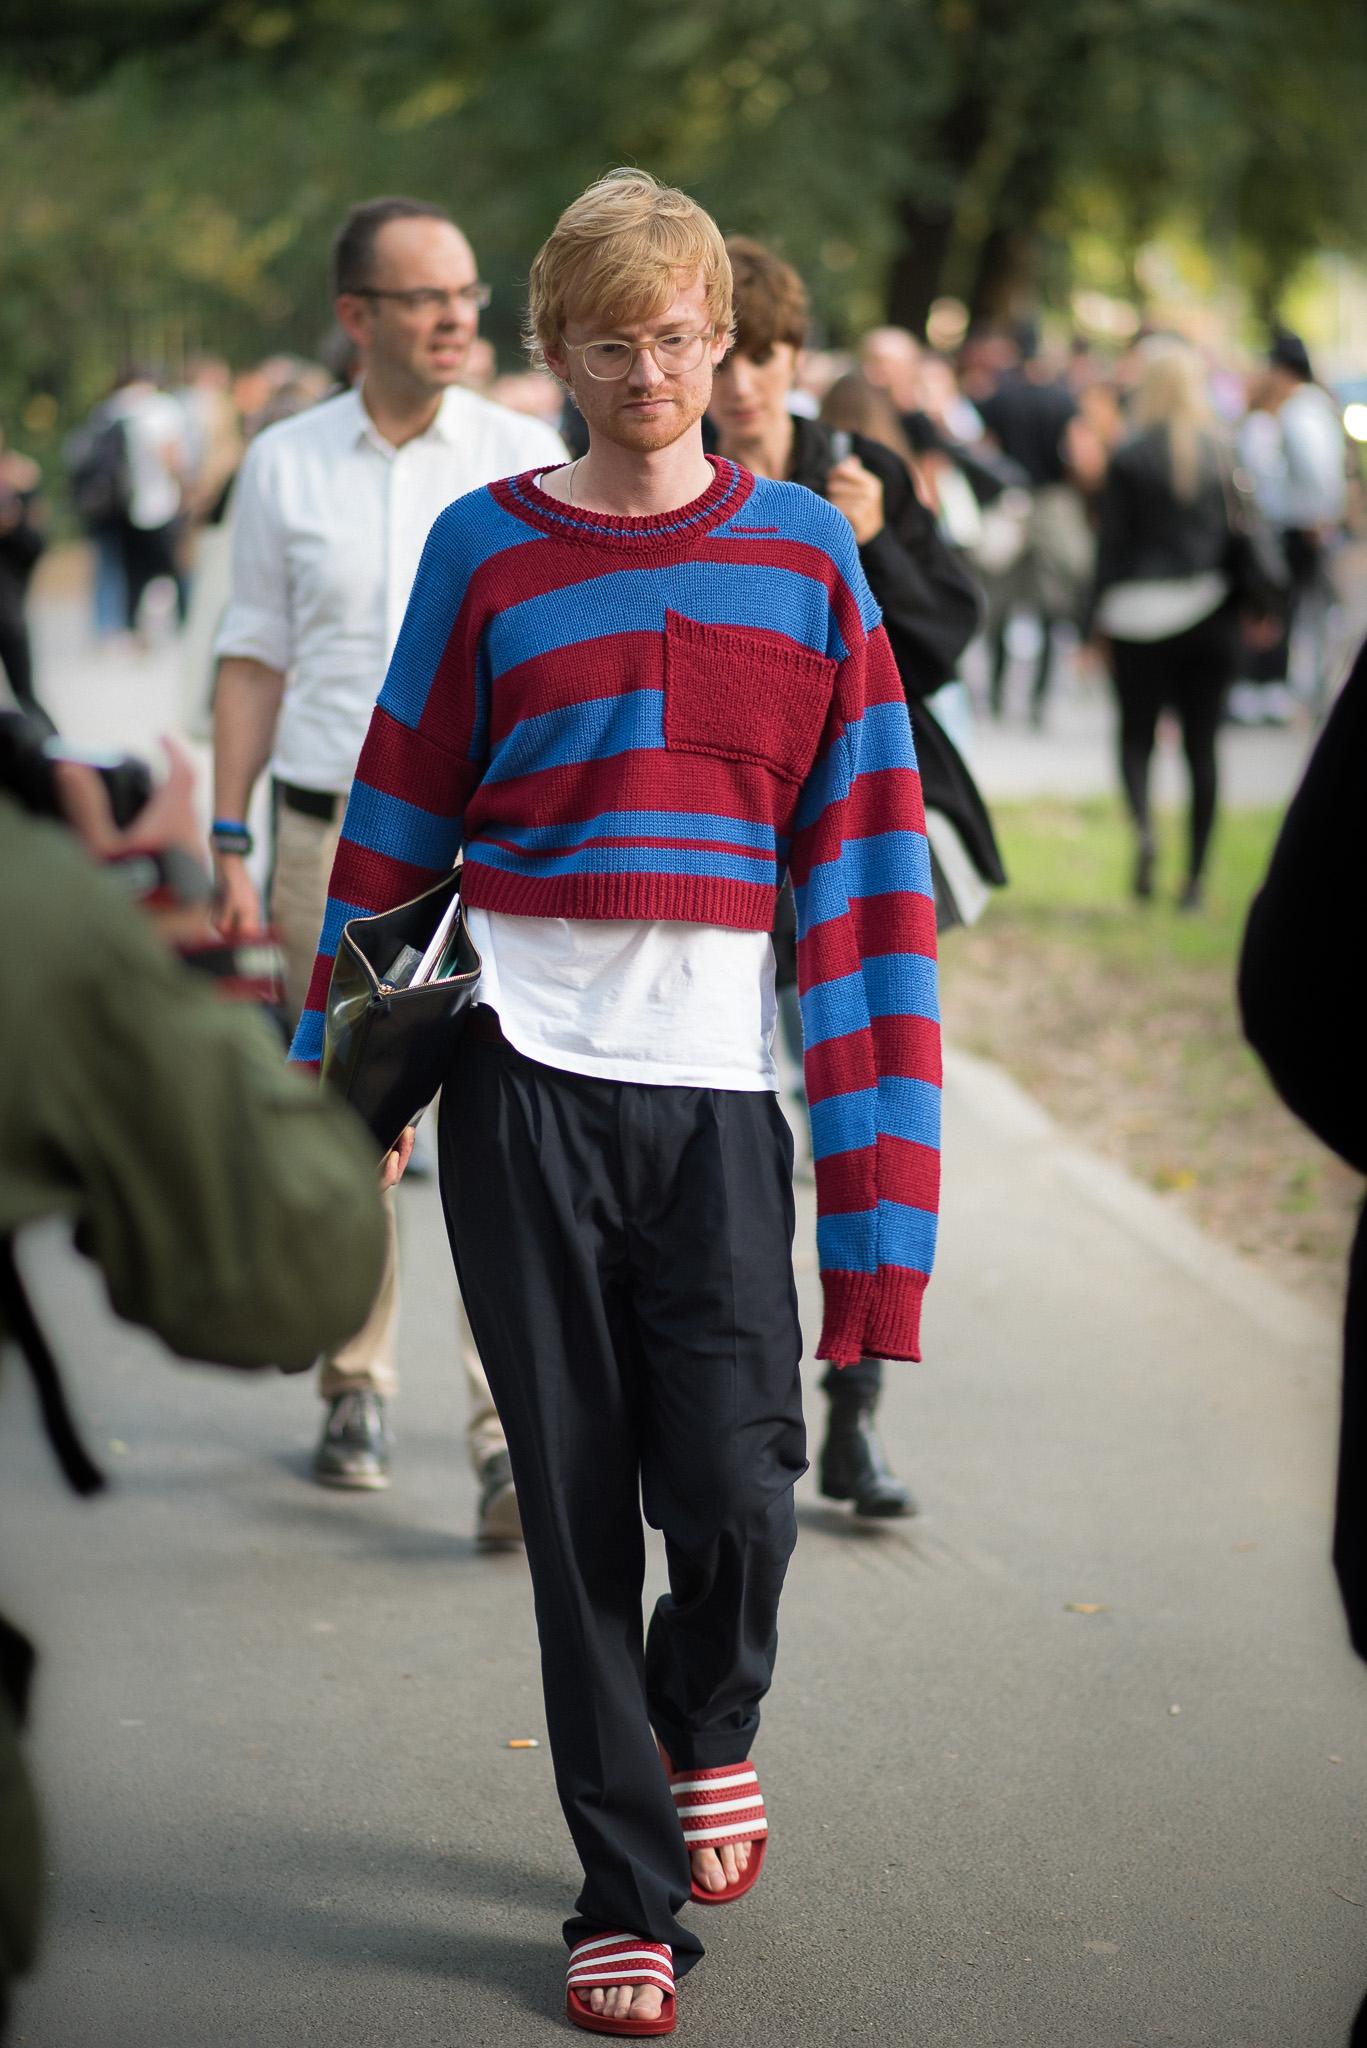 Dennis Braatz Versace MFW September 2017 Photography Annika Lagerqvist www.annikasomething.com